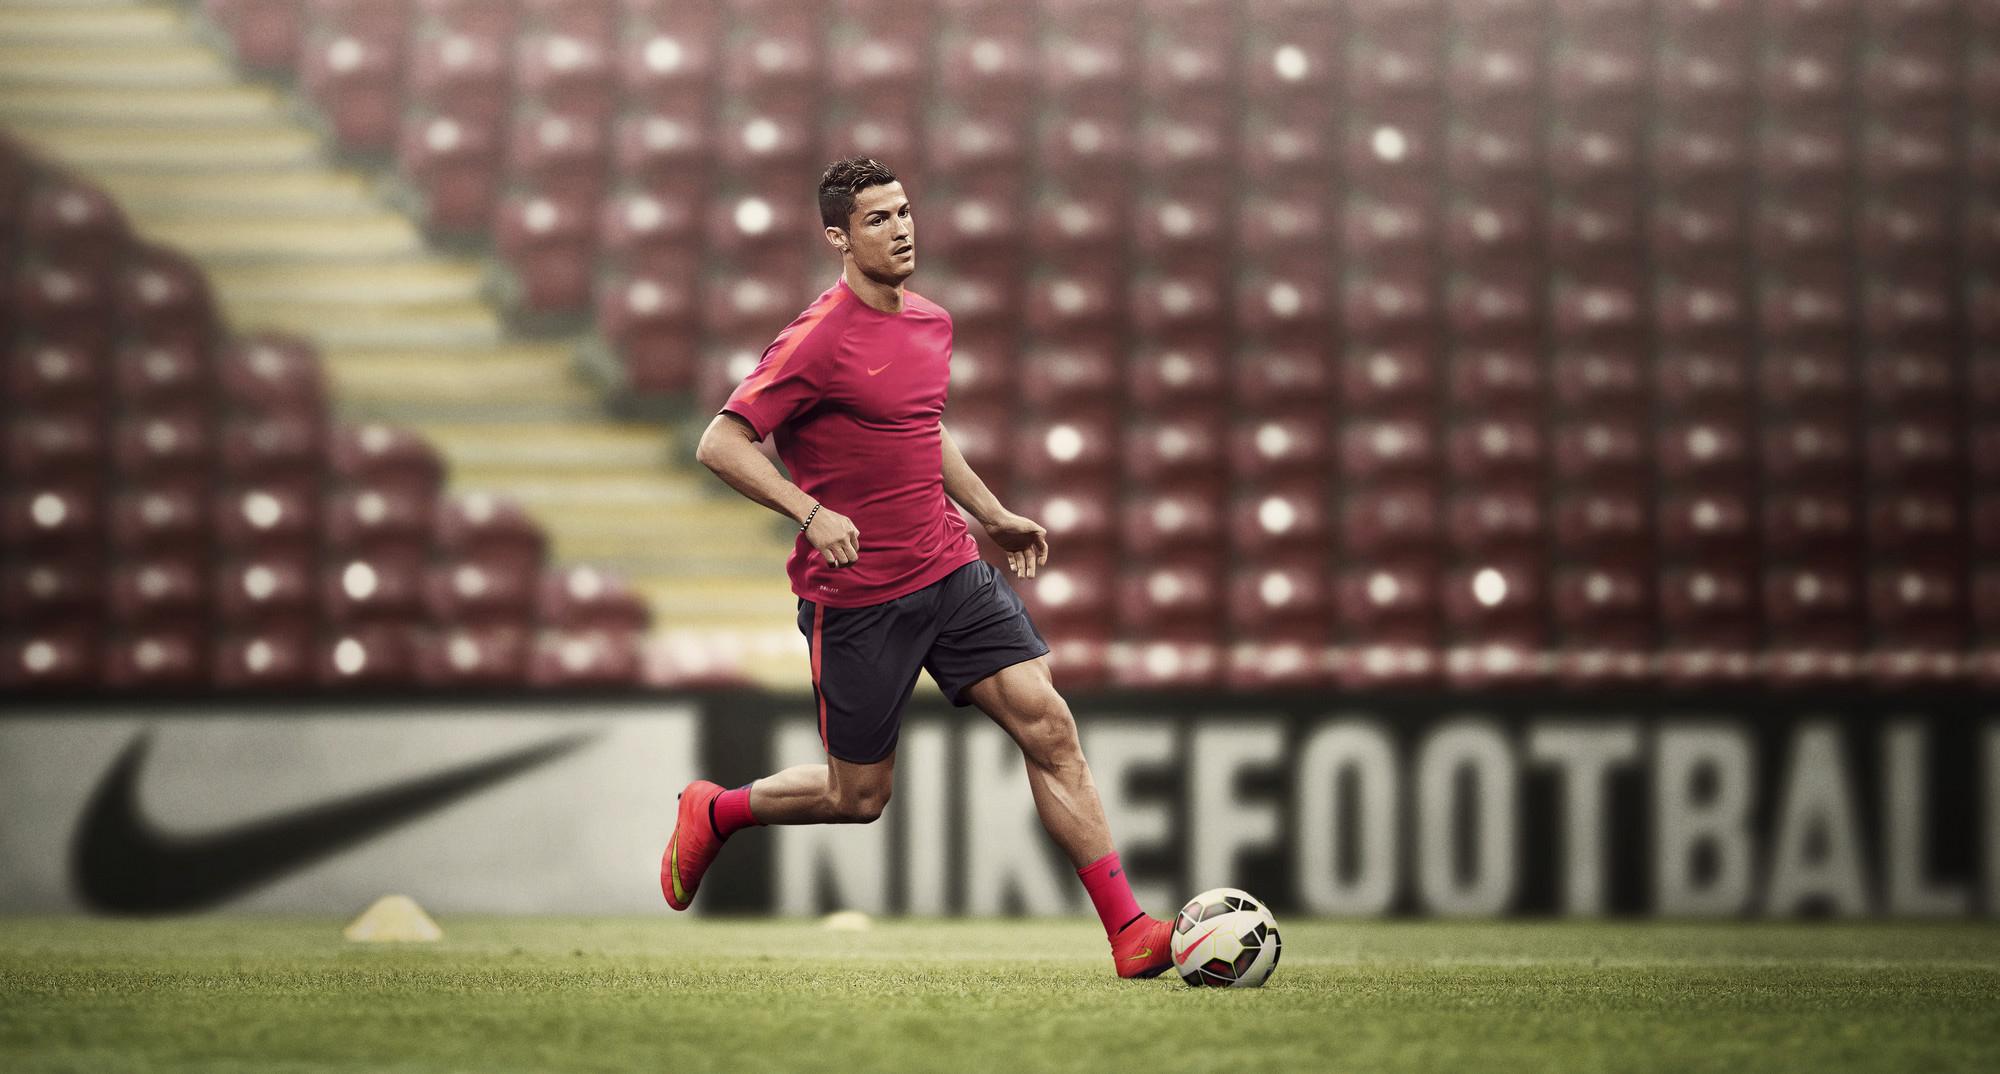 Cristiano Ronaldo Soccer Sports Real Madrid Portugal Wallpaper